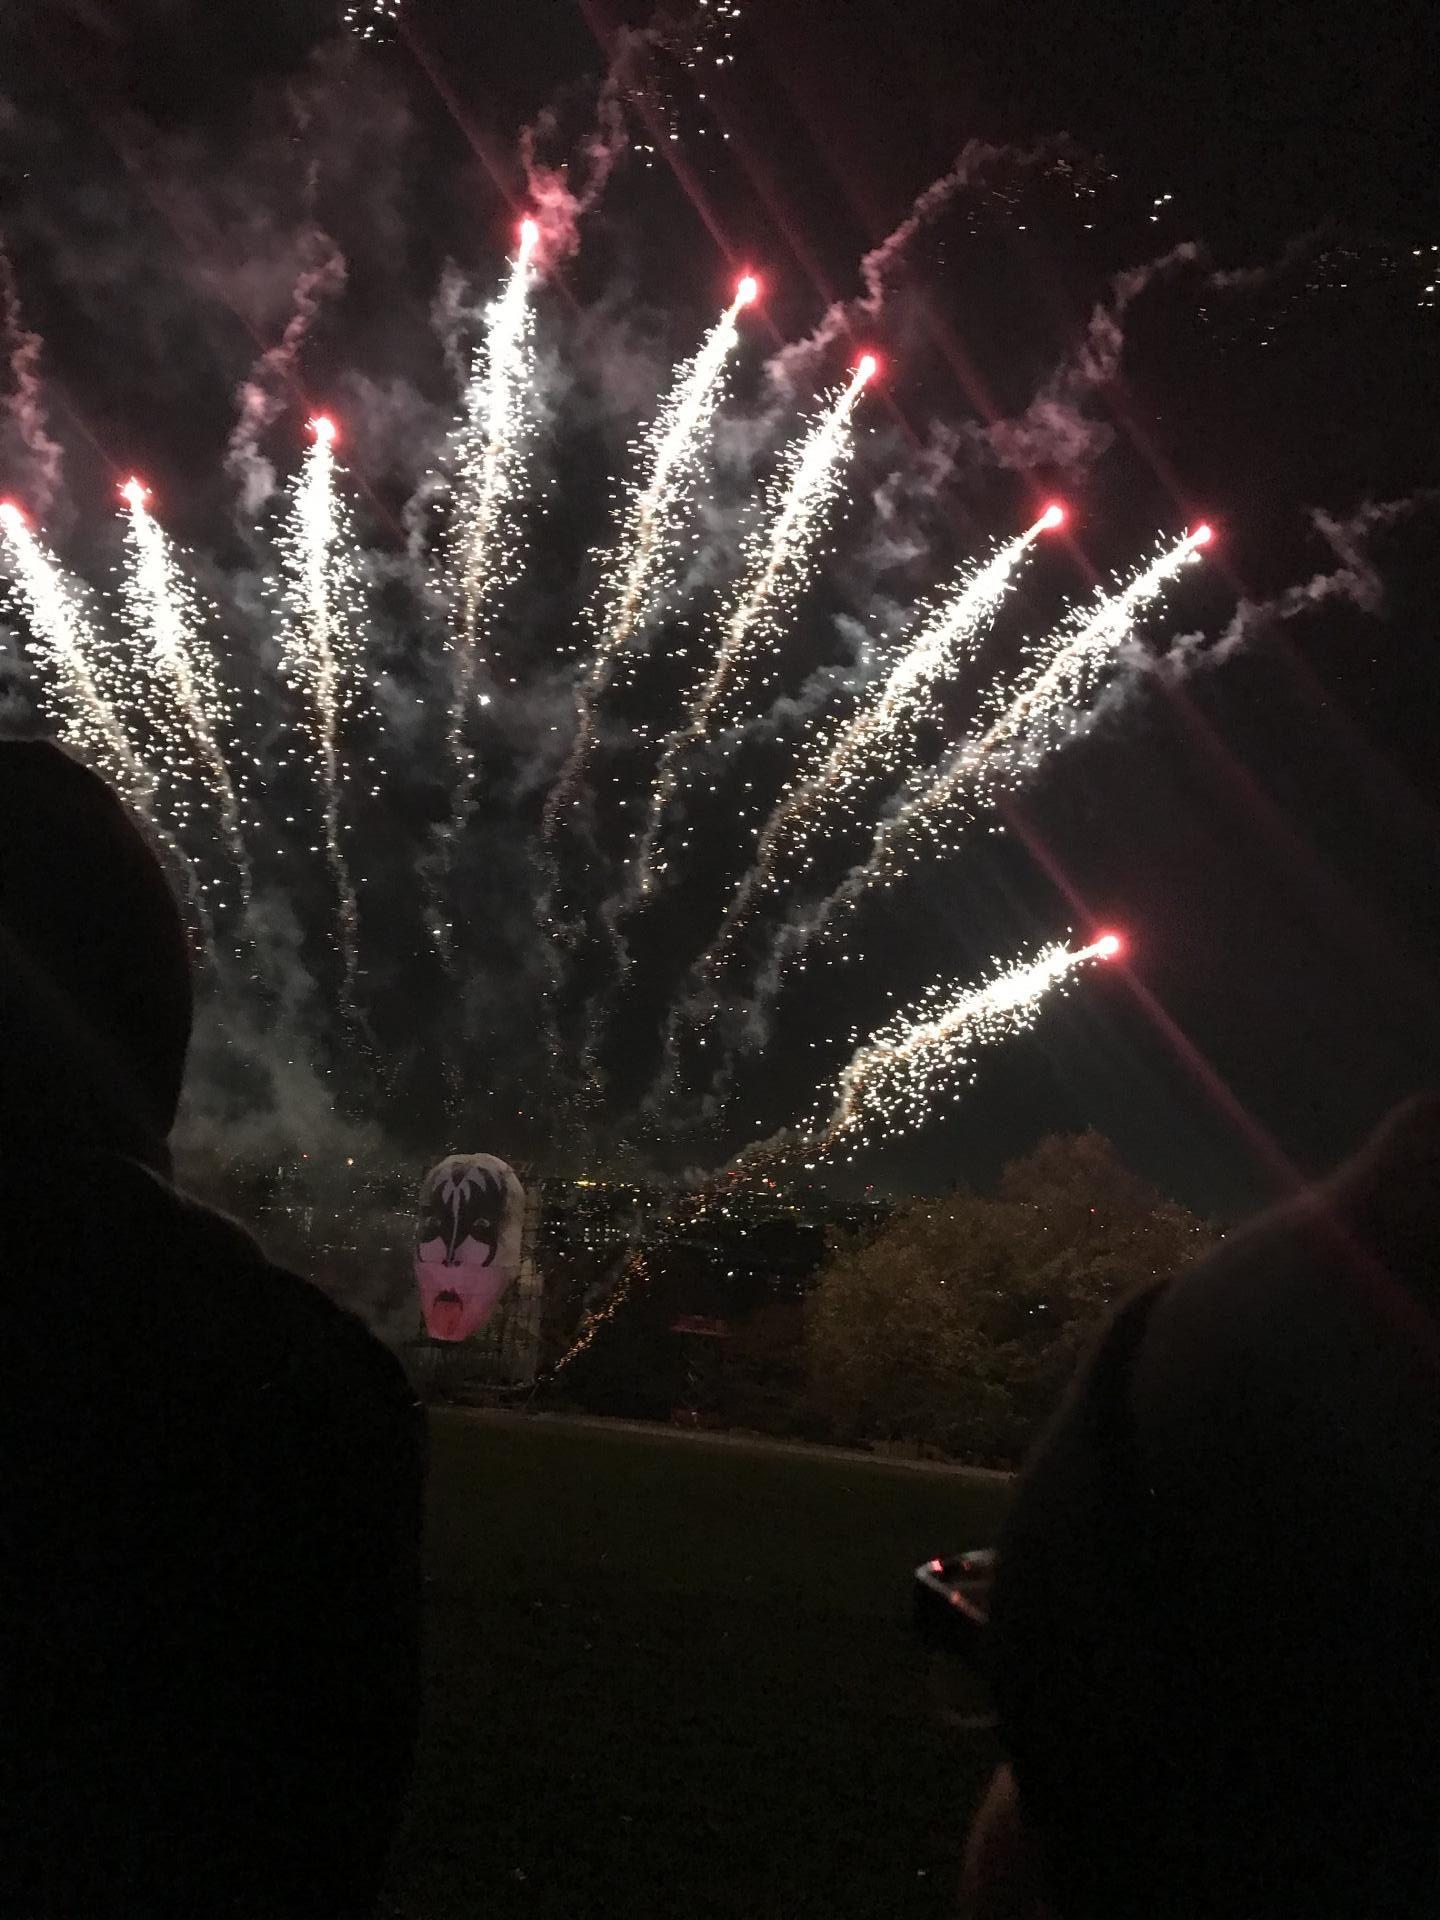 Fireworks night at Alexandra Palace 2018 – Review